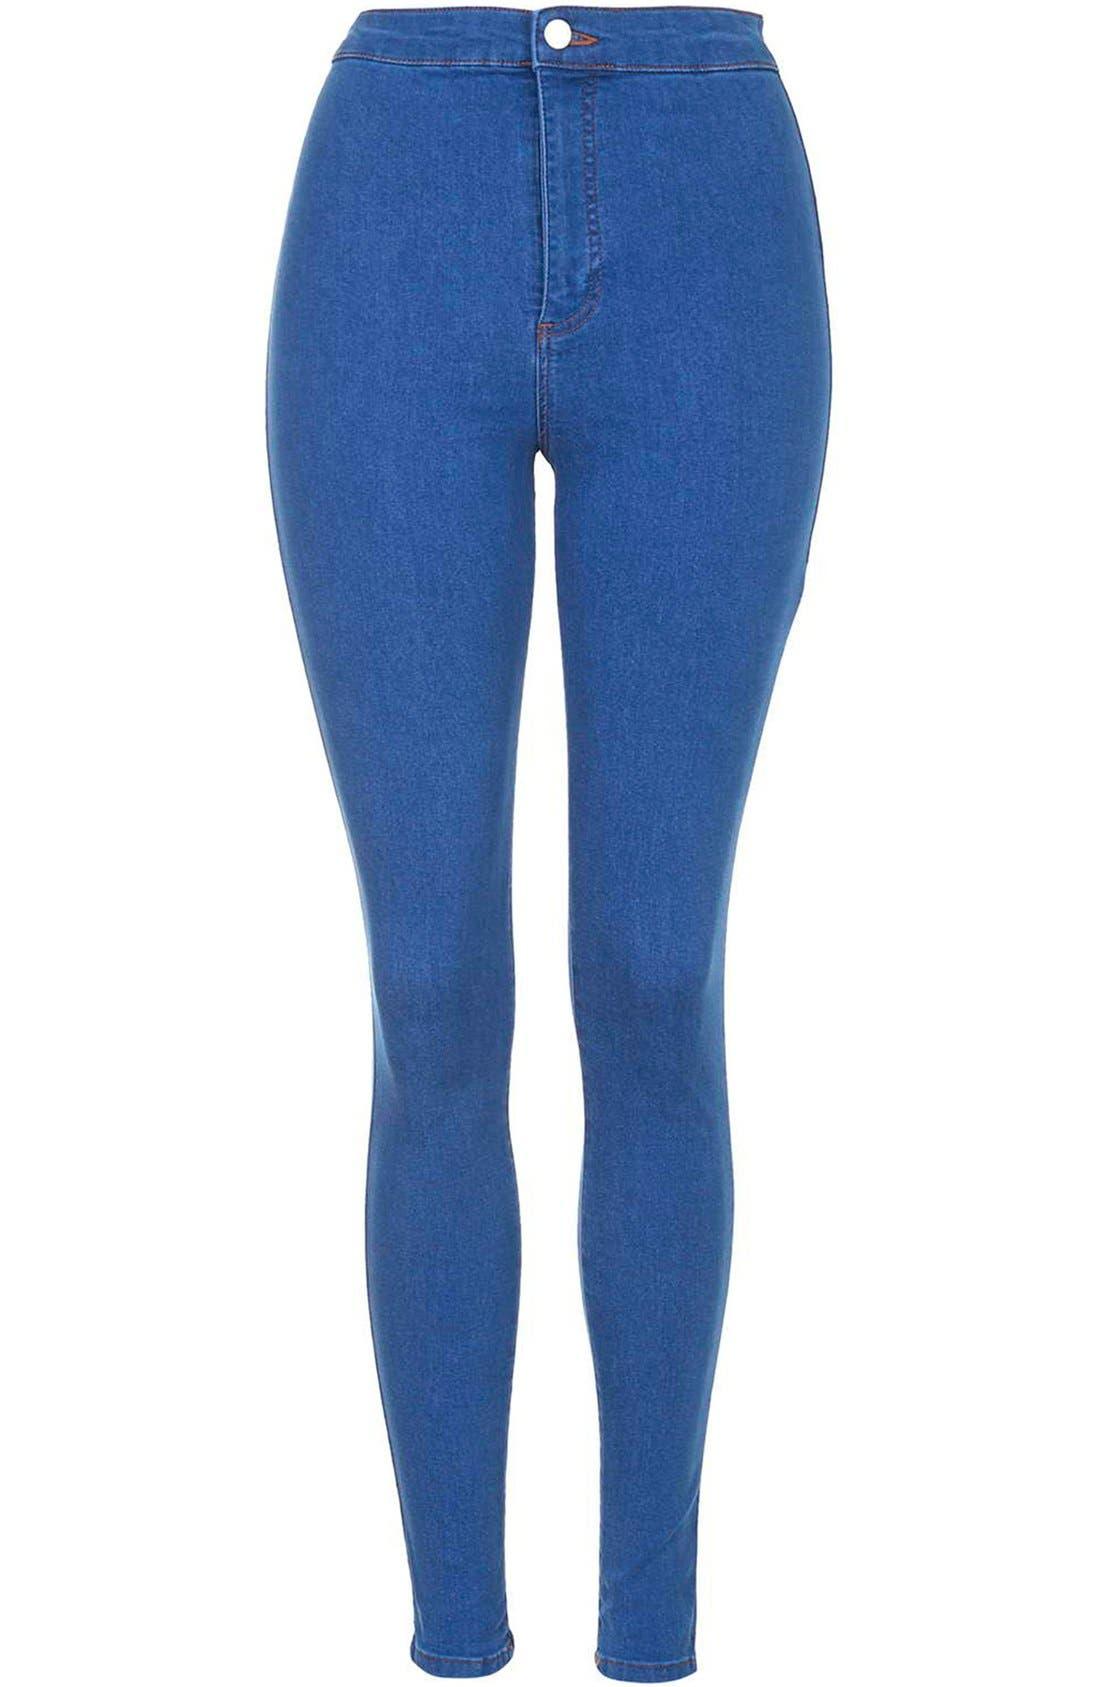 Alternate Image 3  - Topshop Moto 'Joni' High Rise Skinny Jeans (Short)